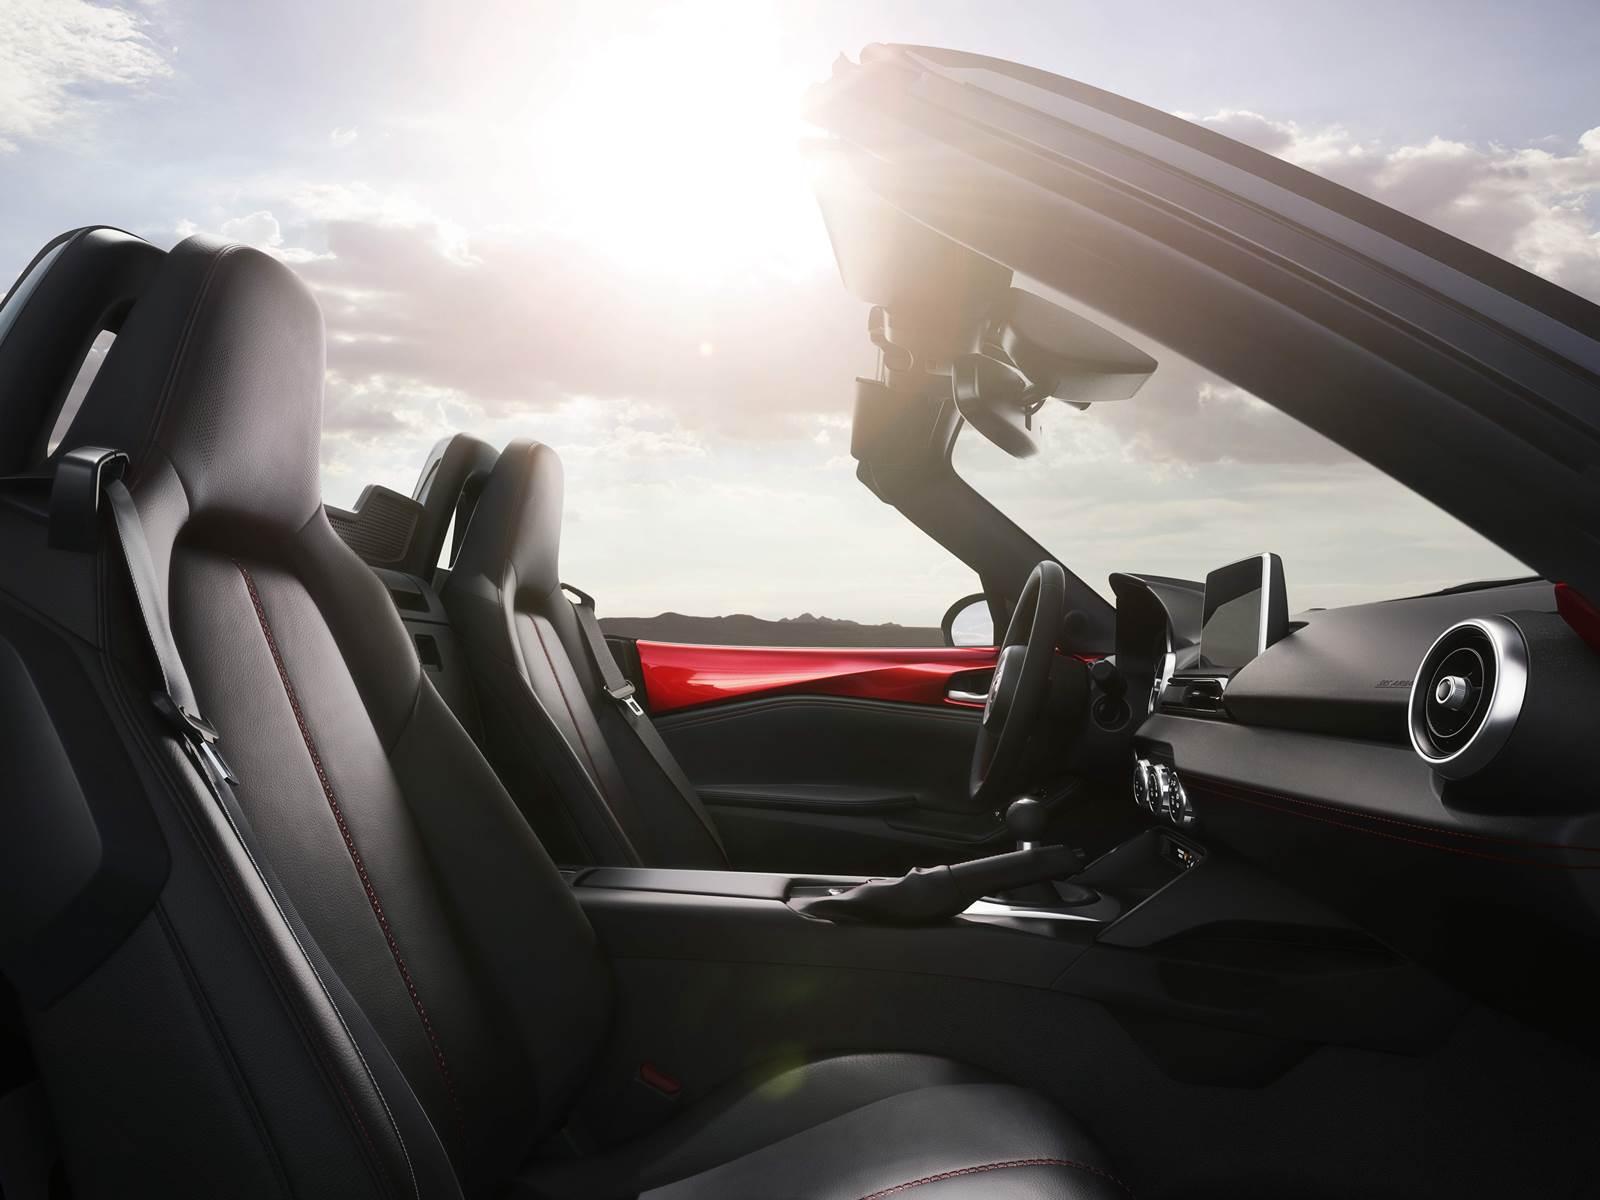 Fiat 124 Spyder / Mazda MX-5 Miata